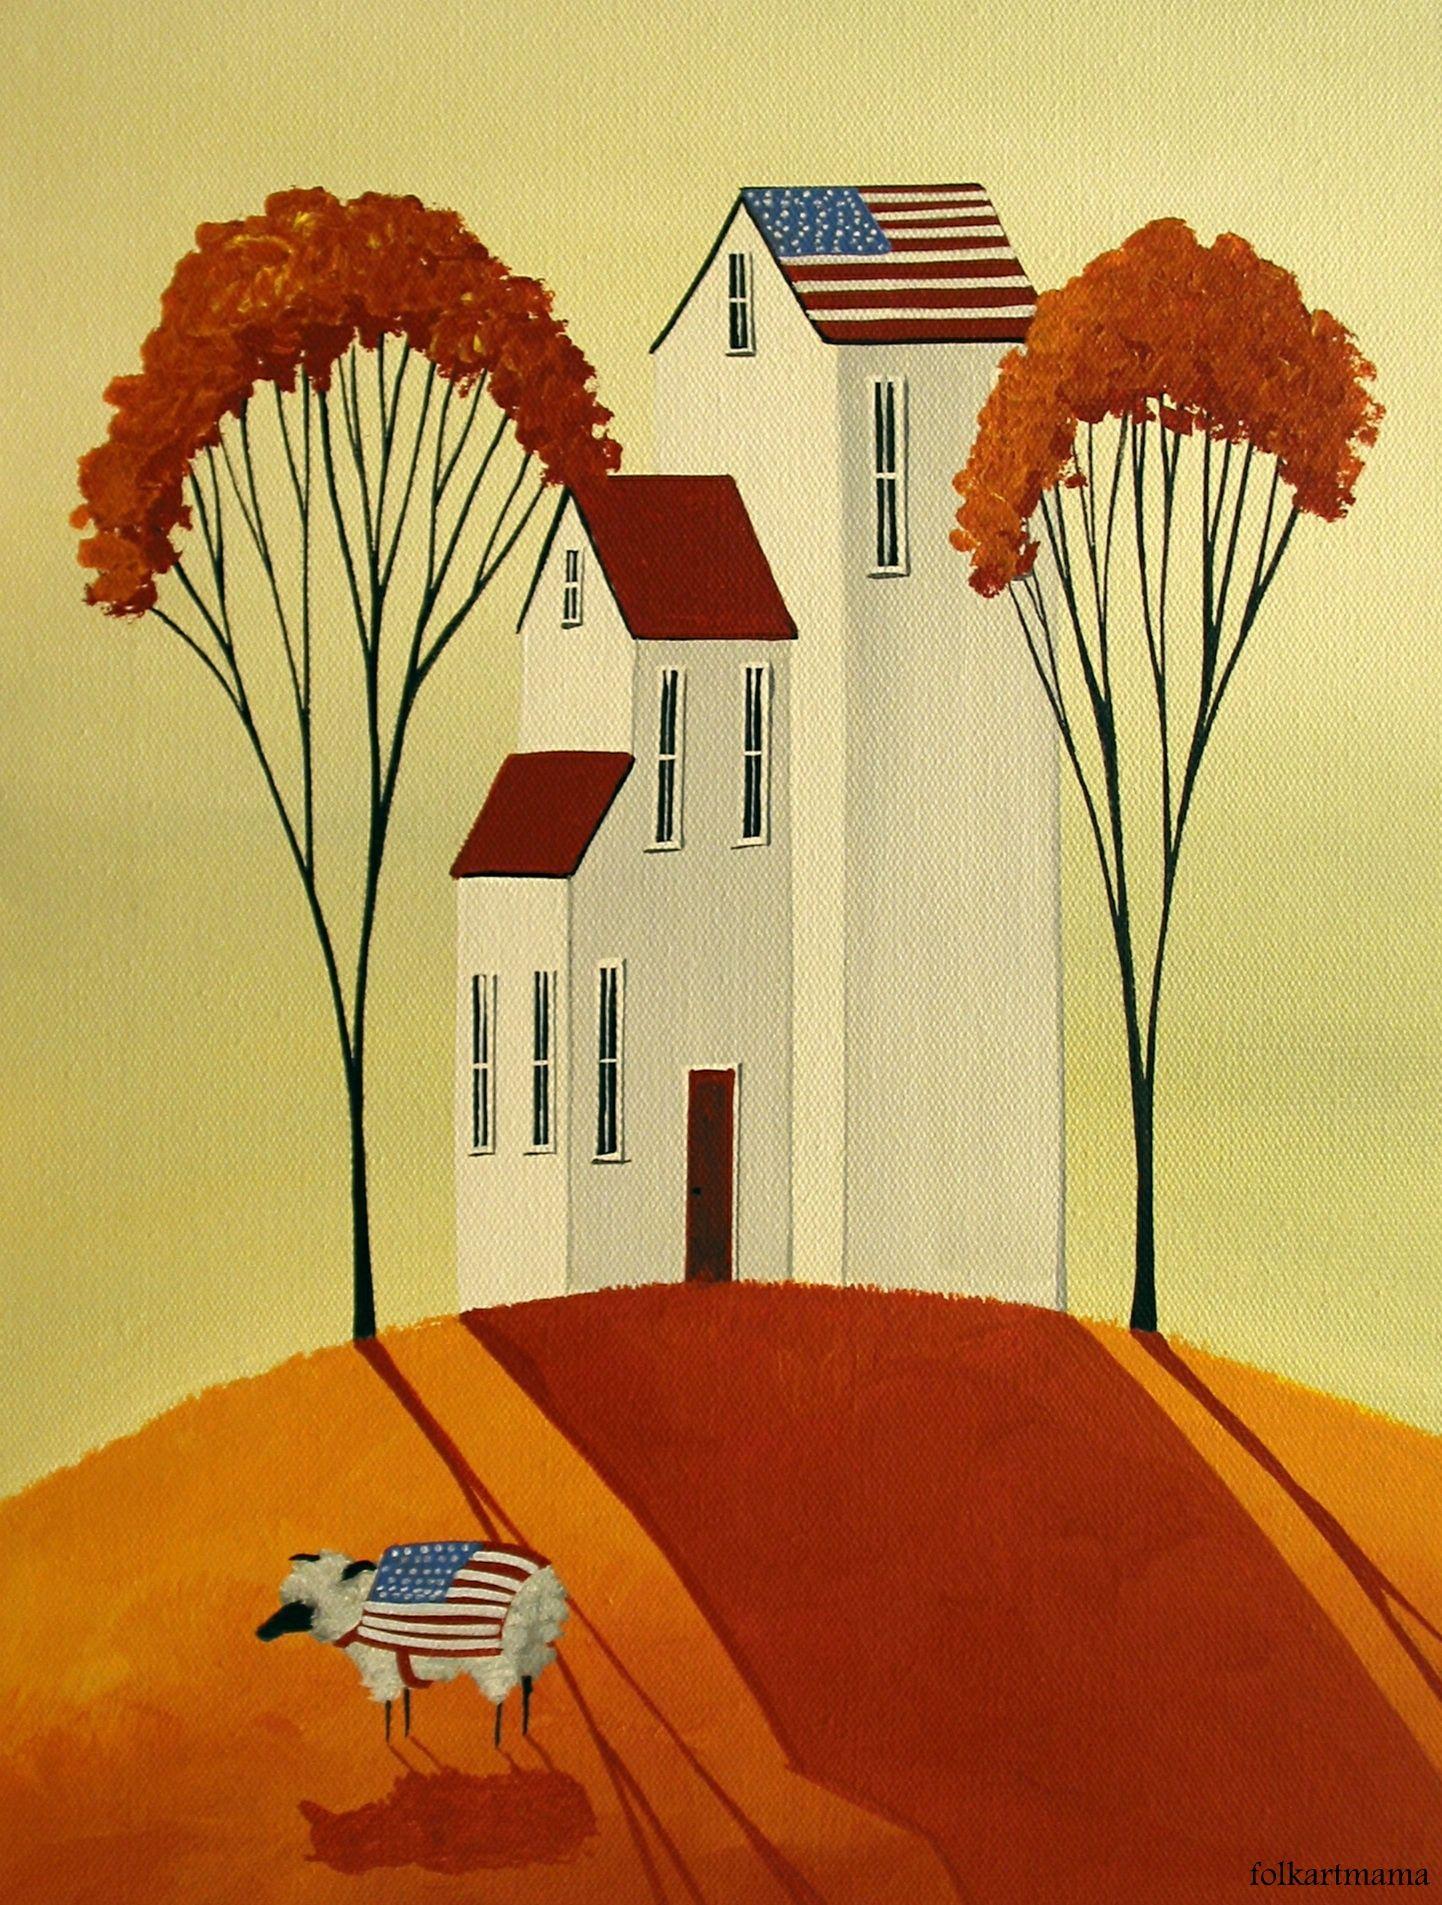 """All American Sheep"" original art by folkartmama My Art"